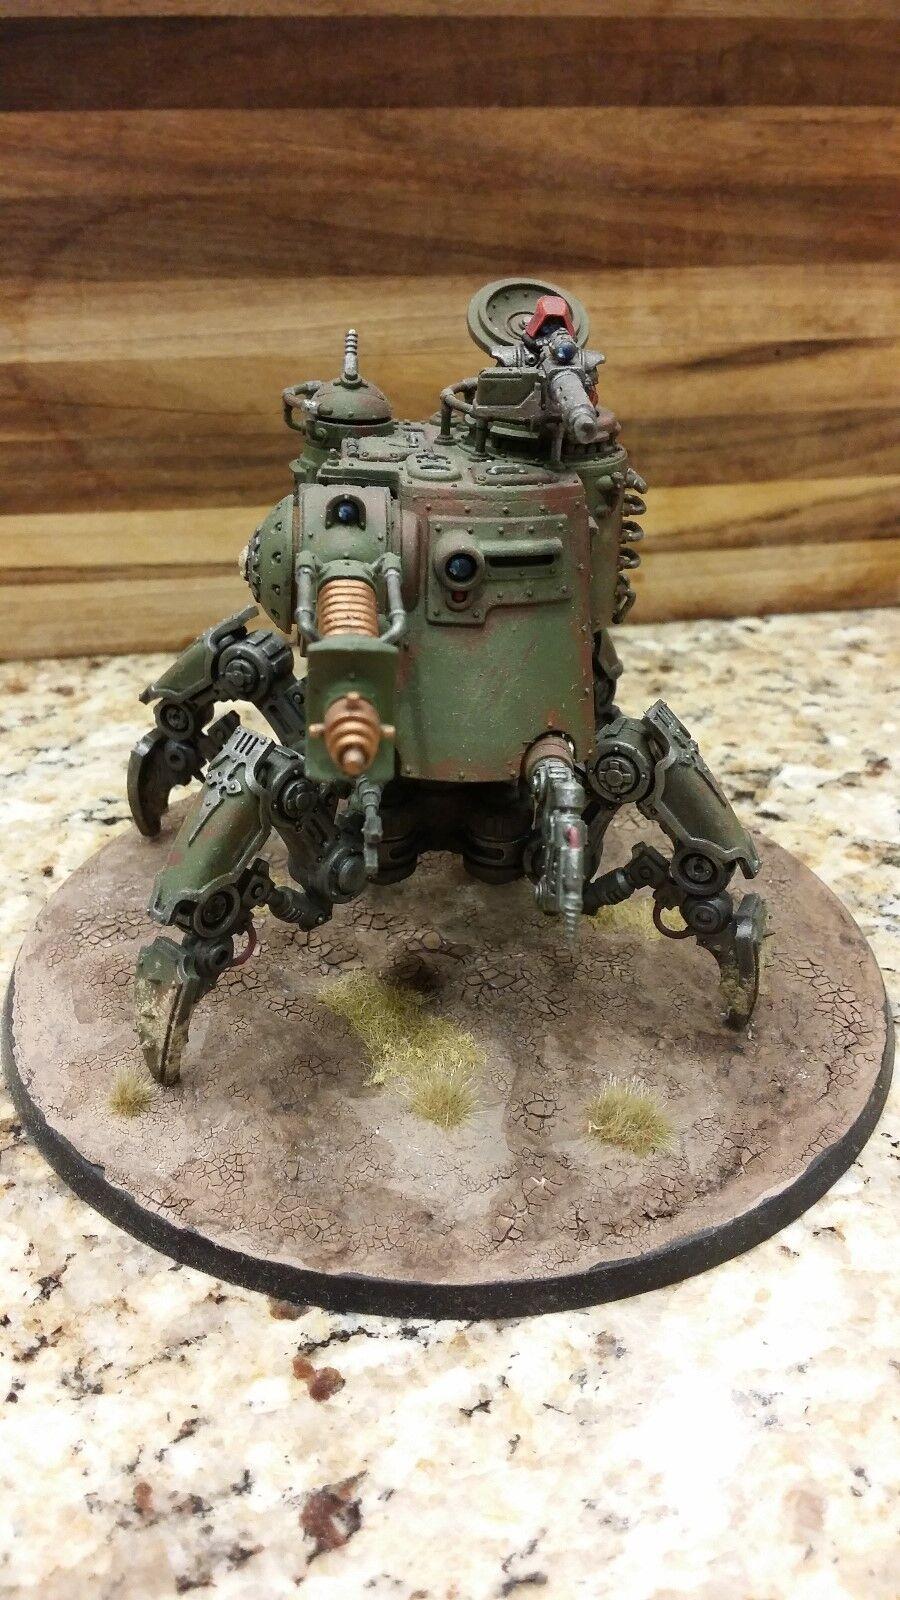 Pintado warhammer 40k adeptus mechanicus skitarii Onagro dunecrawler Pro